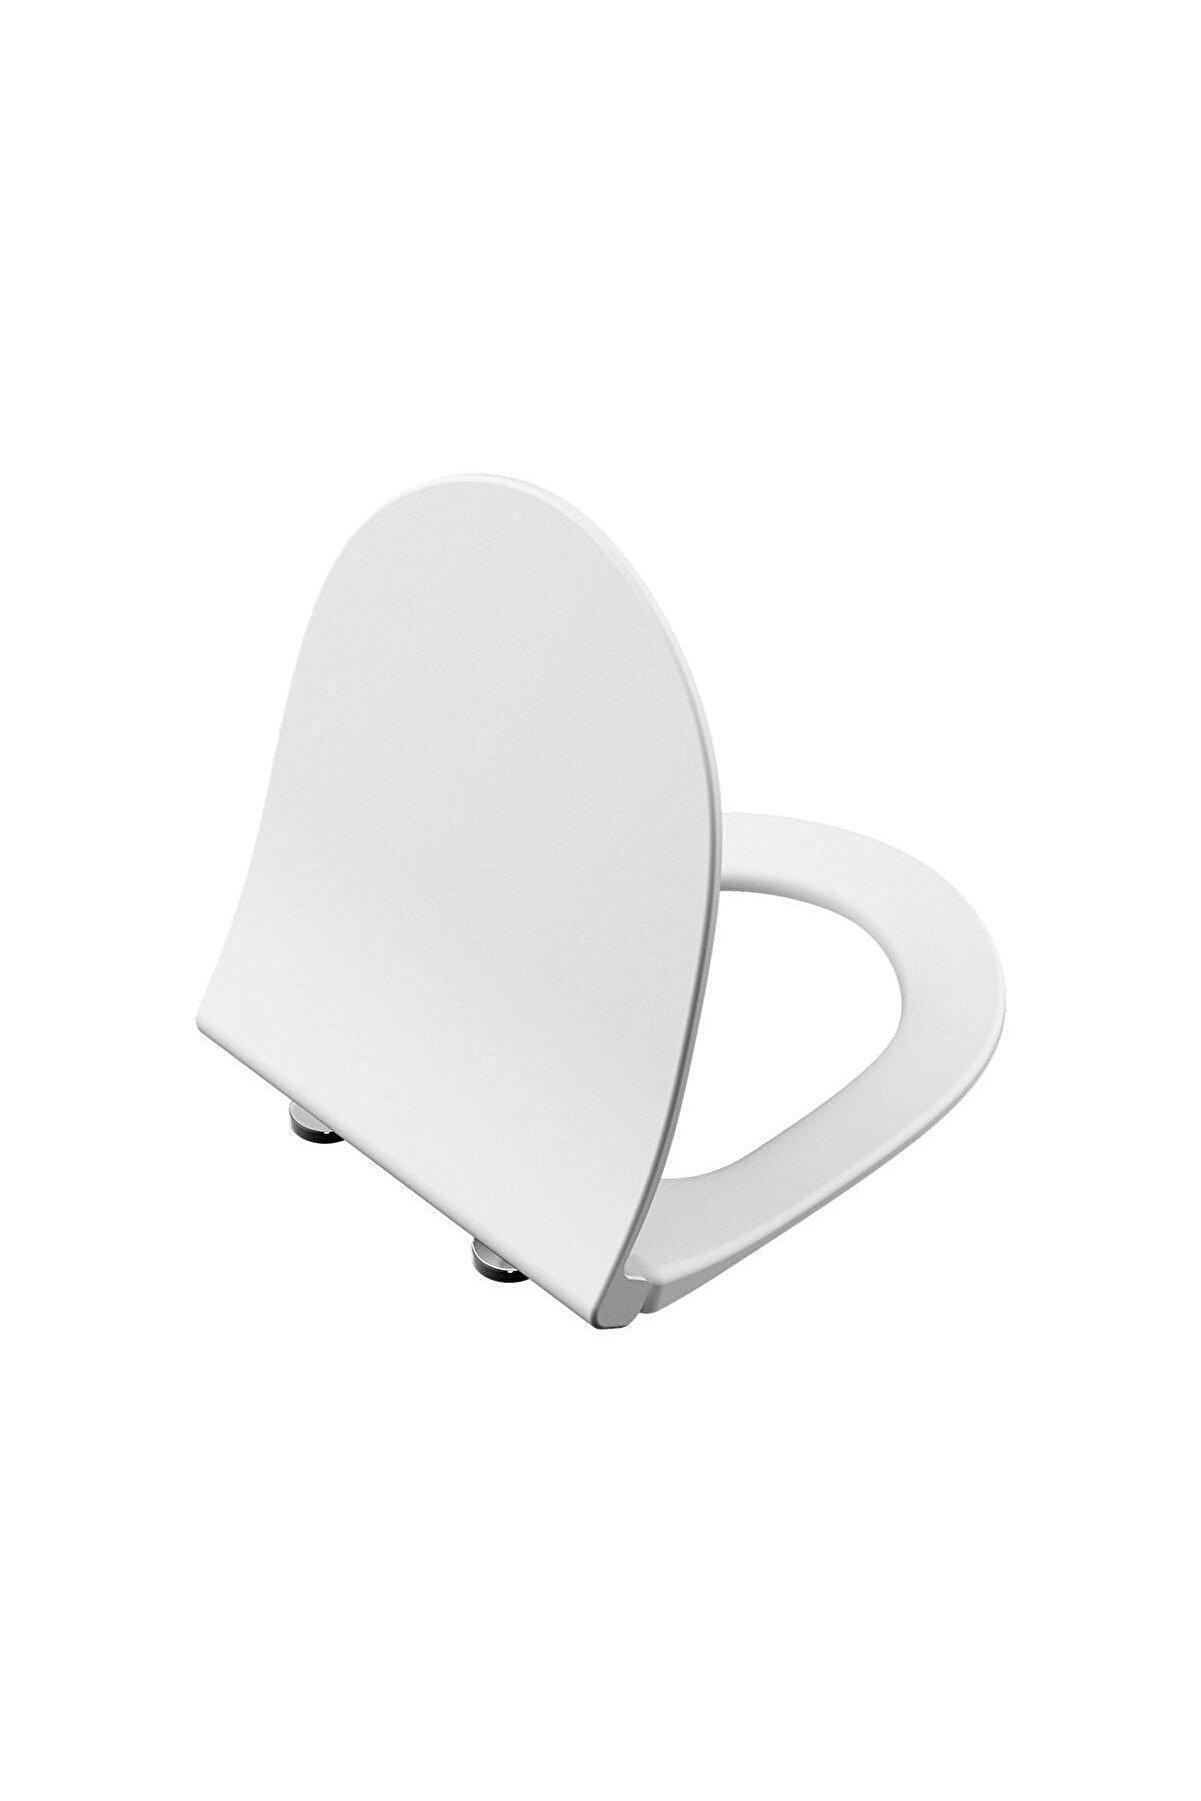 VitrA Sento 120-003-009 Slim Klozet Kapağı, Yavaş Kapanır, Beyaz